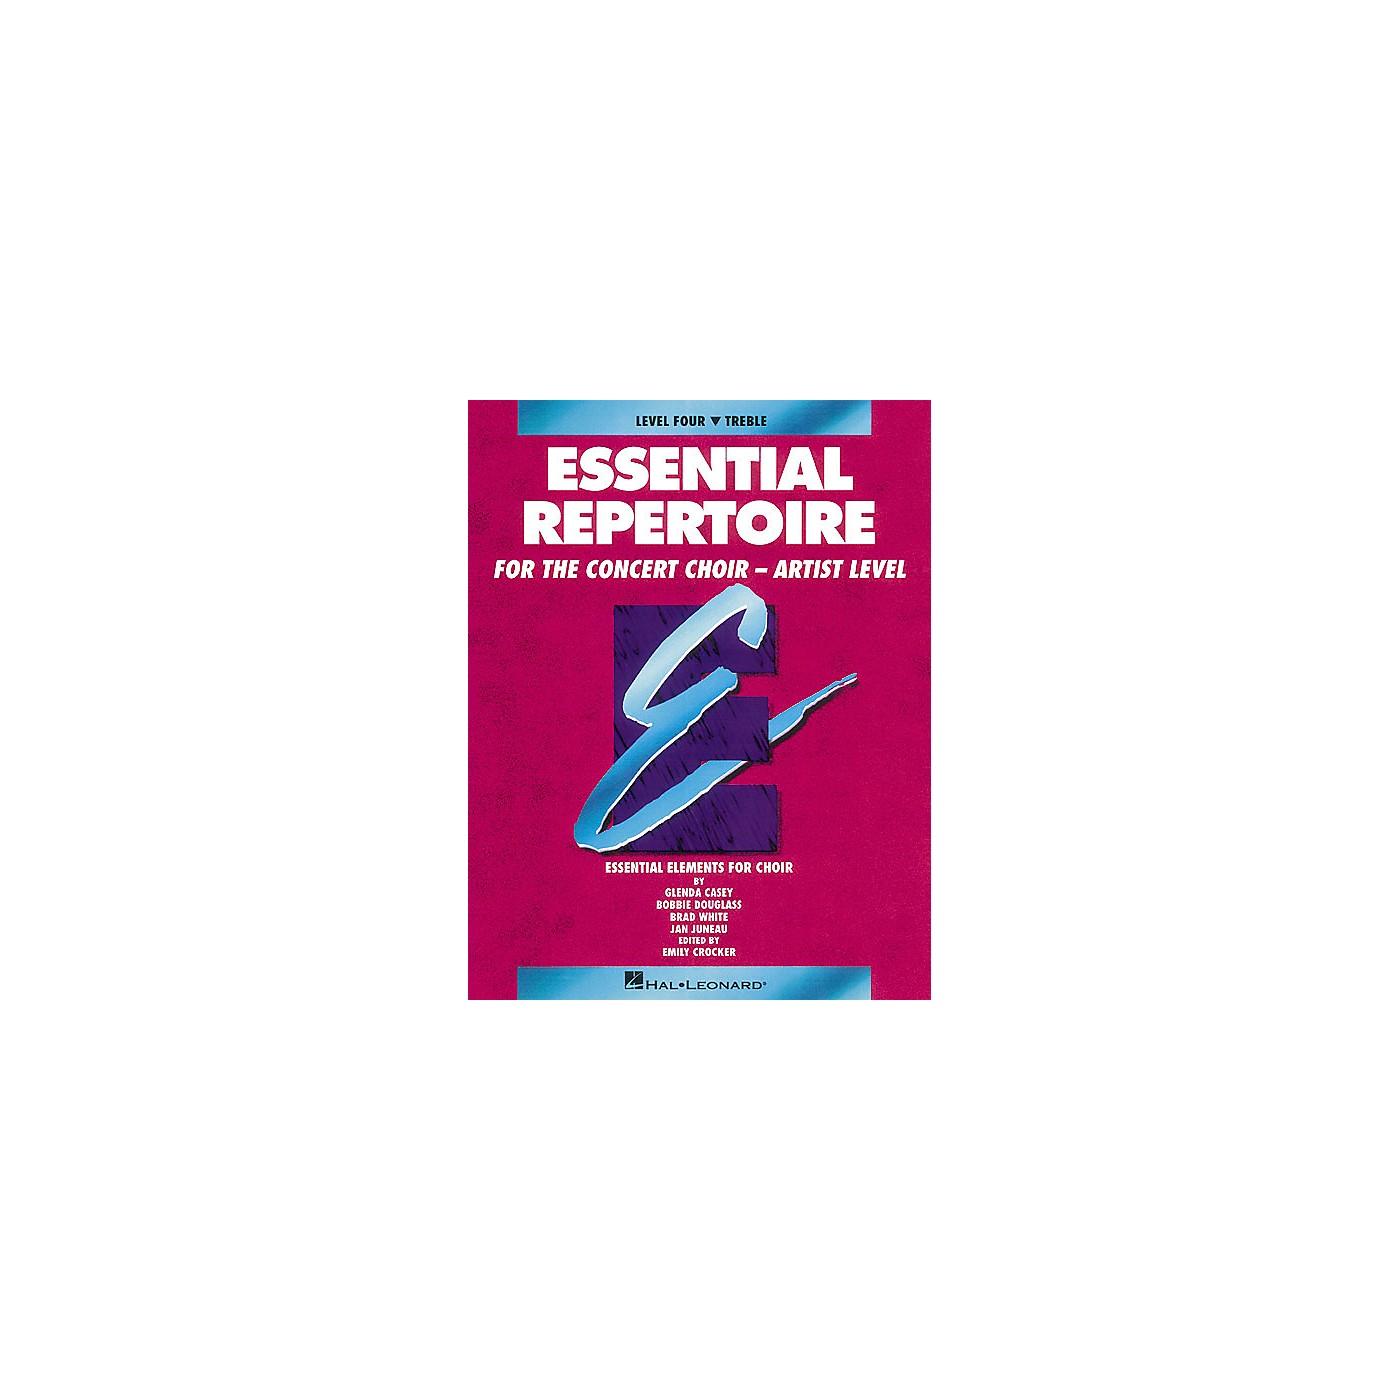 Hal Leonard Essential Repertoire for the Concert Choir - Artist Level Treble Part-Learning CDs (2) by Glenda Casey thumbnail